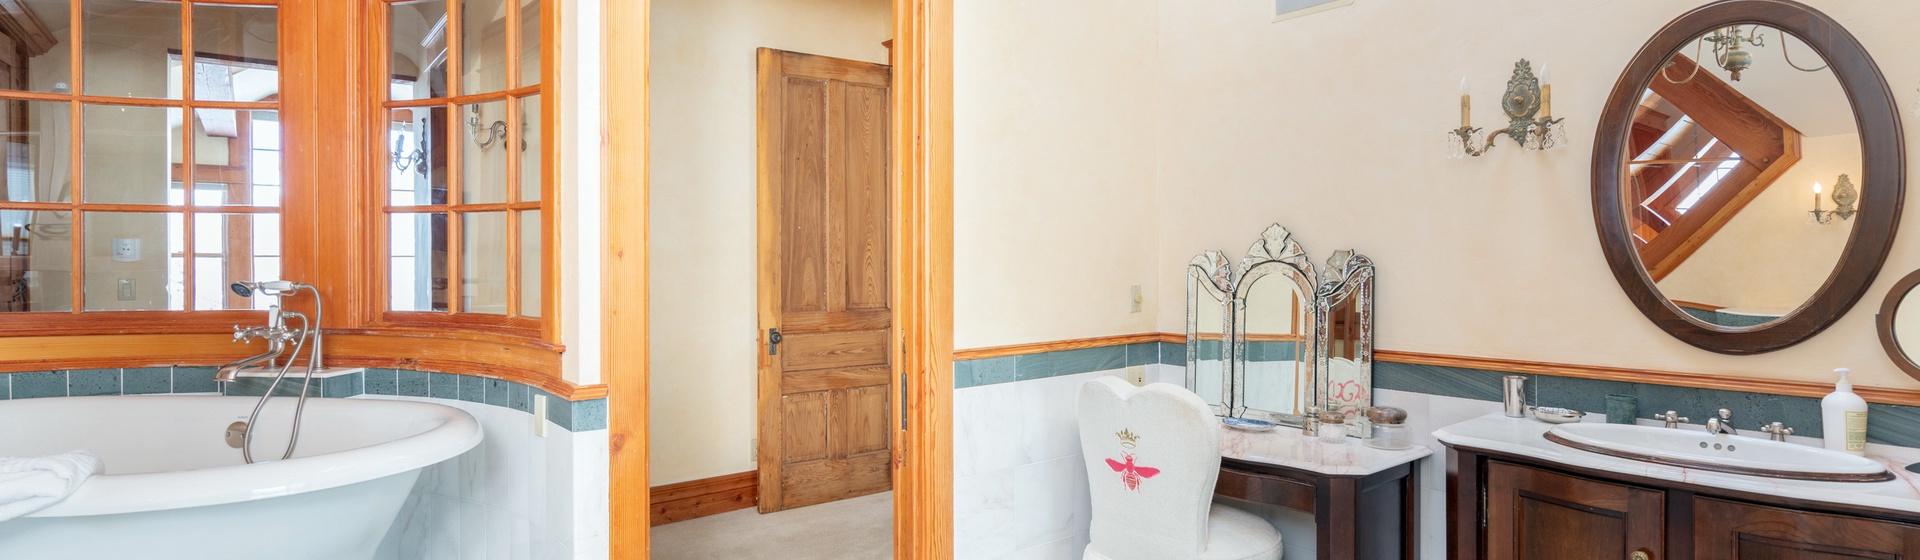 12-MountainVillage-Positive-Outlook-Master-Bathroom-Vanity-Web.jpg